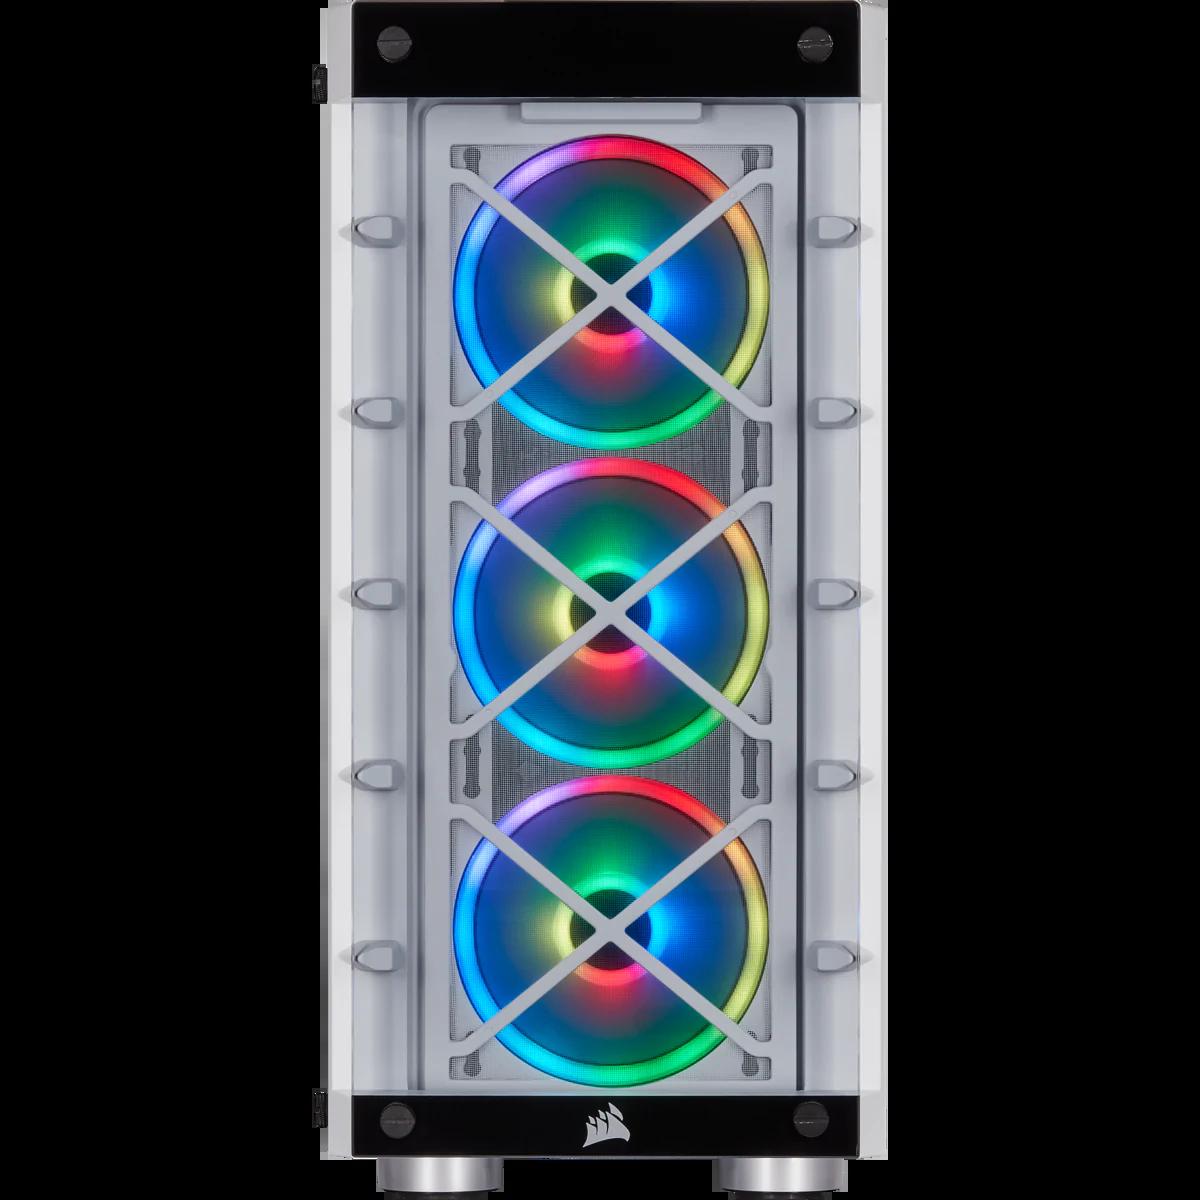 Gabinete Gamer Corsair, iCue 465X RGB, Mid Tower, Vidro Temperado, ATX, White, CC-9011189-WW, Sem Fonte, Com 3 Fans, CC-9011189-WW